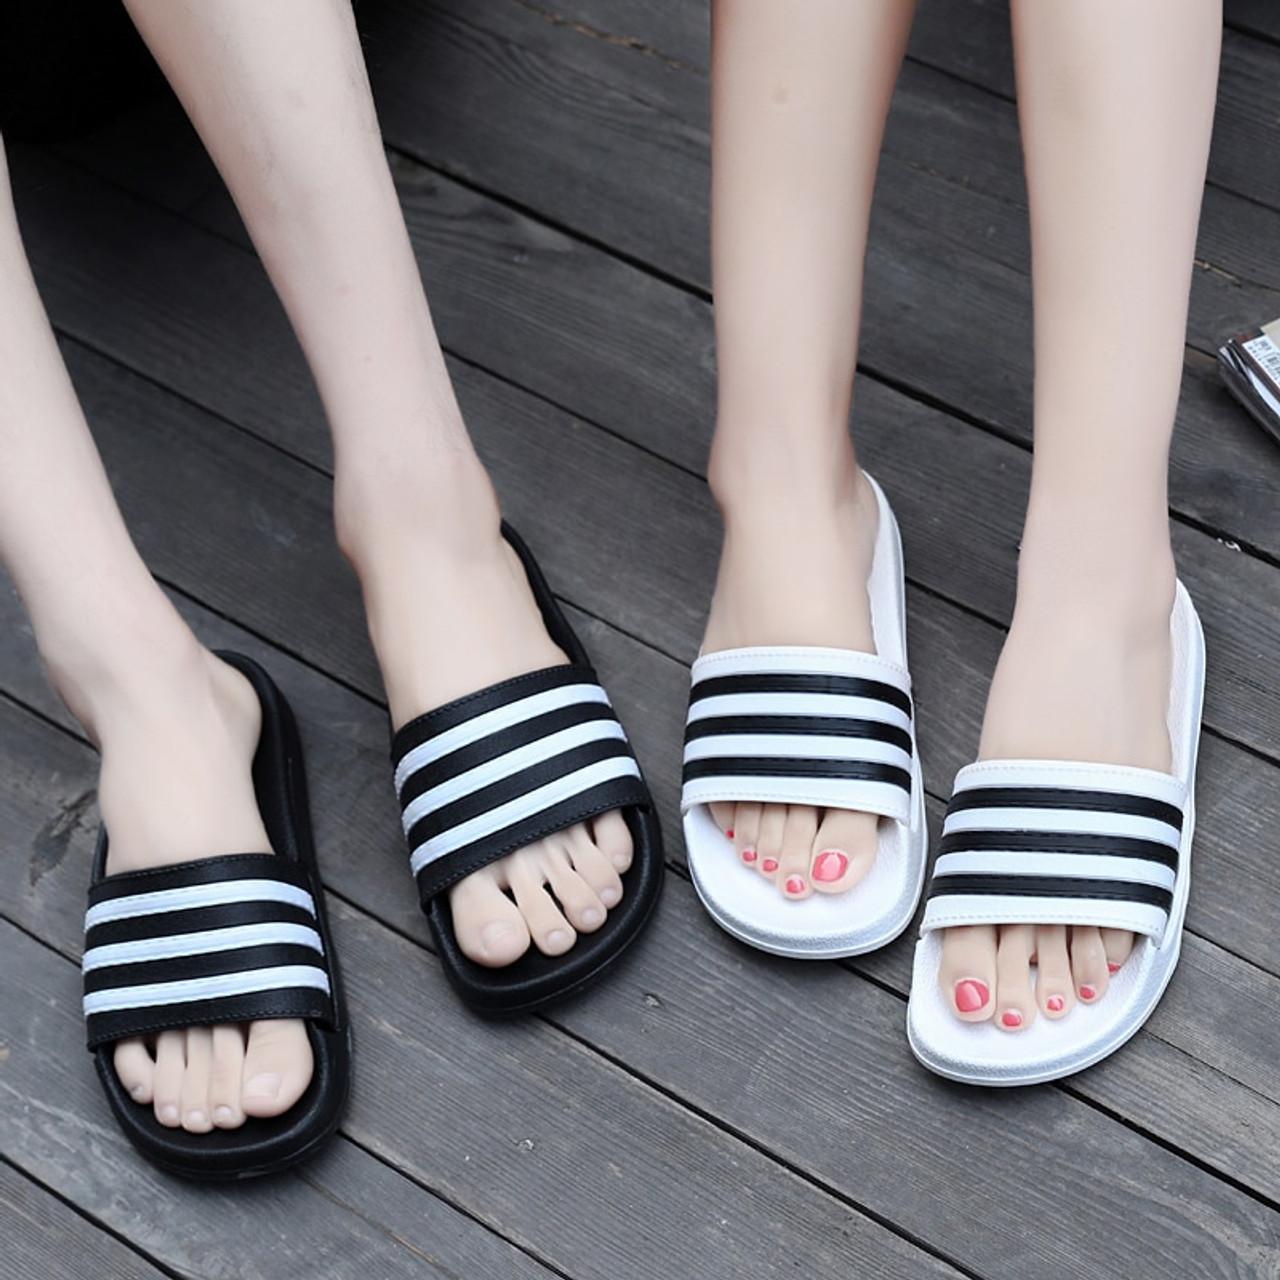 e5e0b25aa95 ... 2018 New Summer Beach Slippers Men Women Fashion Stripe Flat Bath Home  Slipers Male Shoes Summer ...